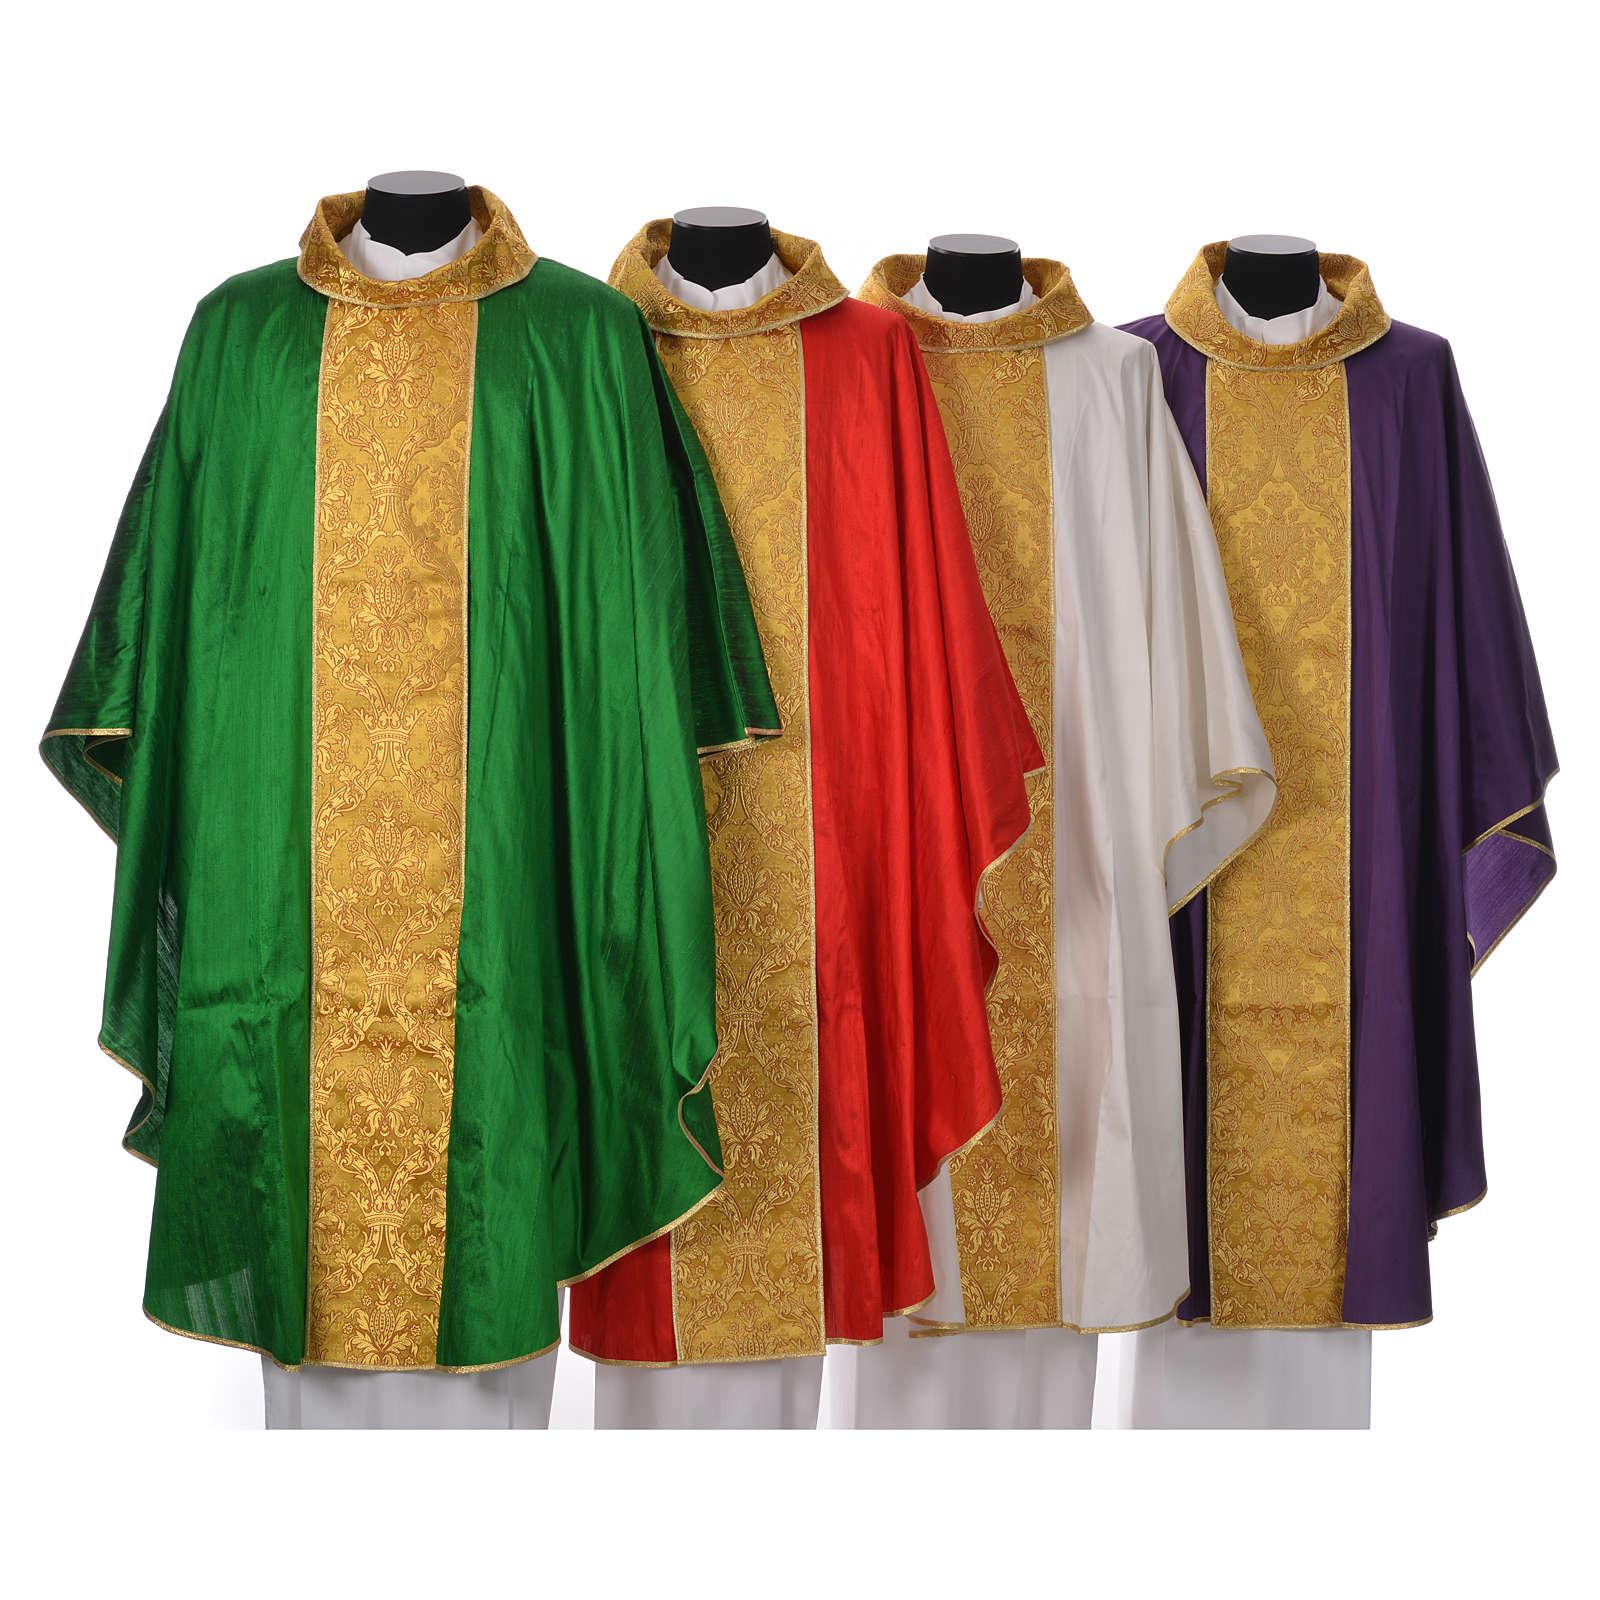 Casula sacerdotale seta 100% ricamo dorato 4